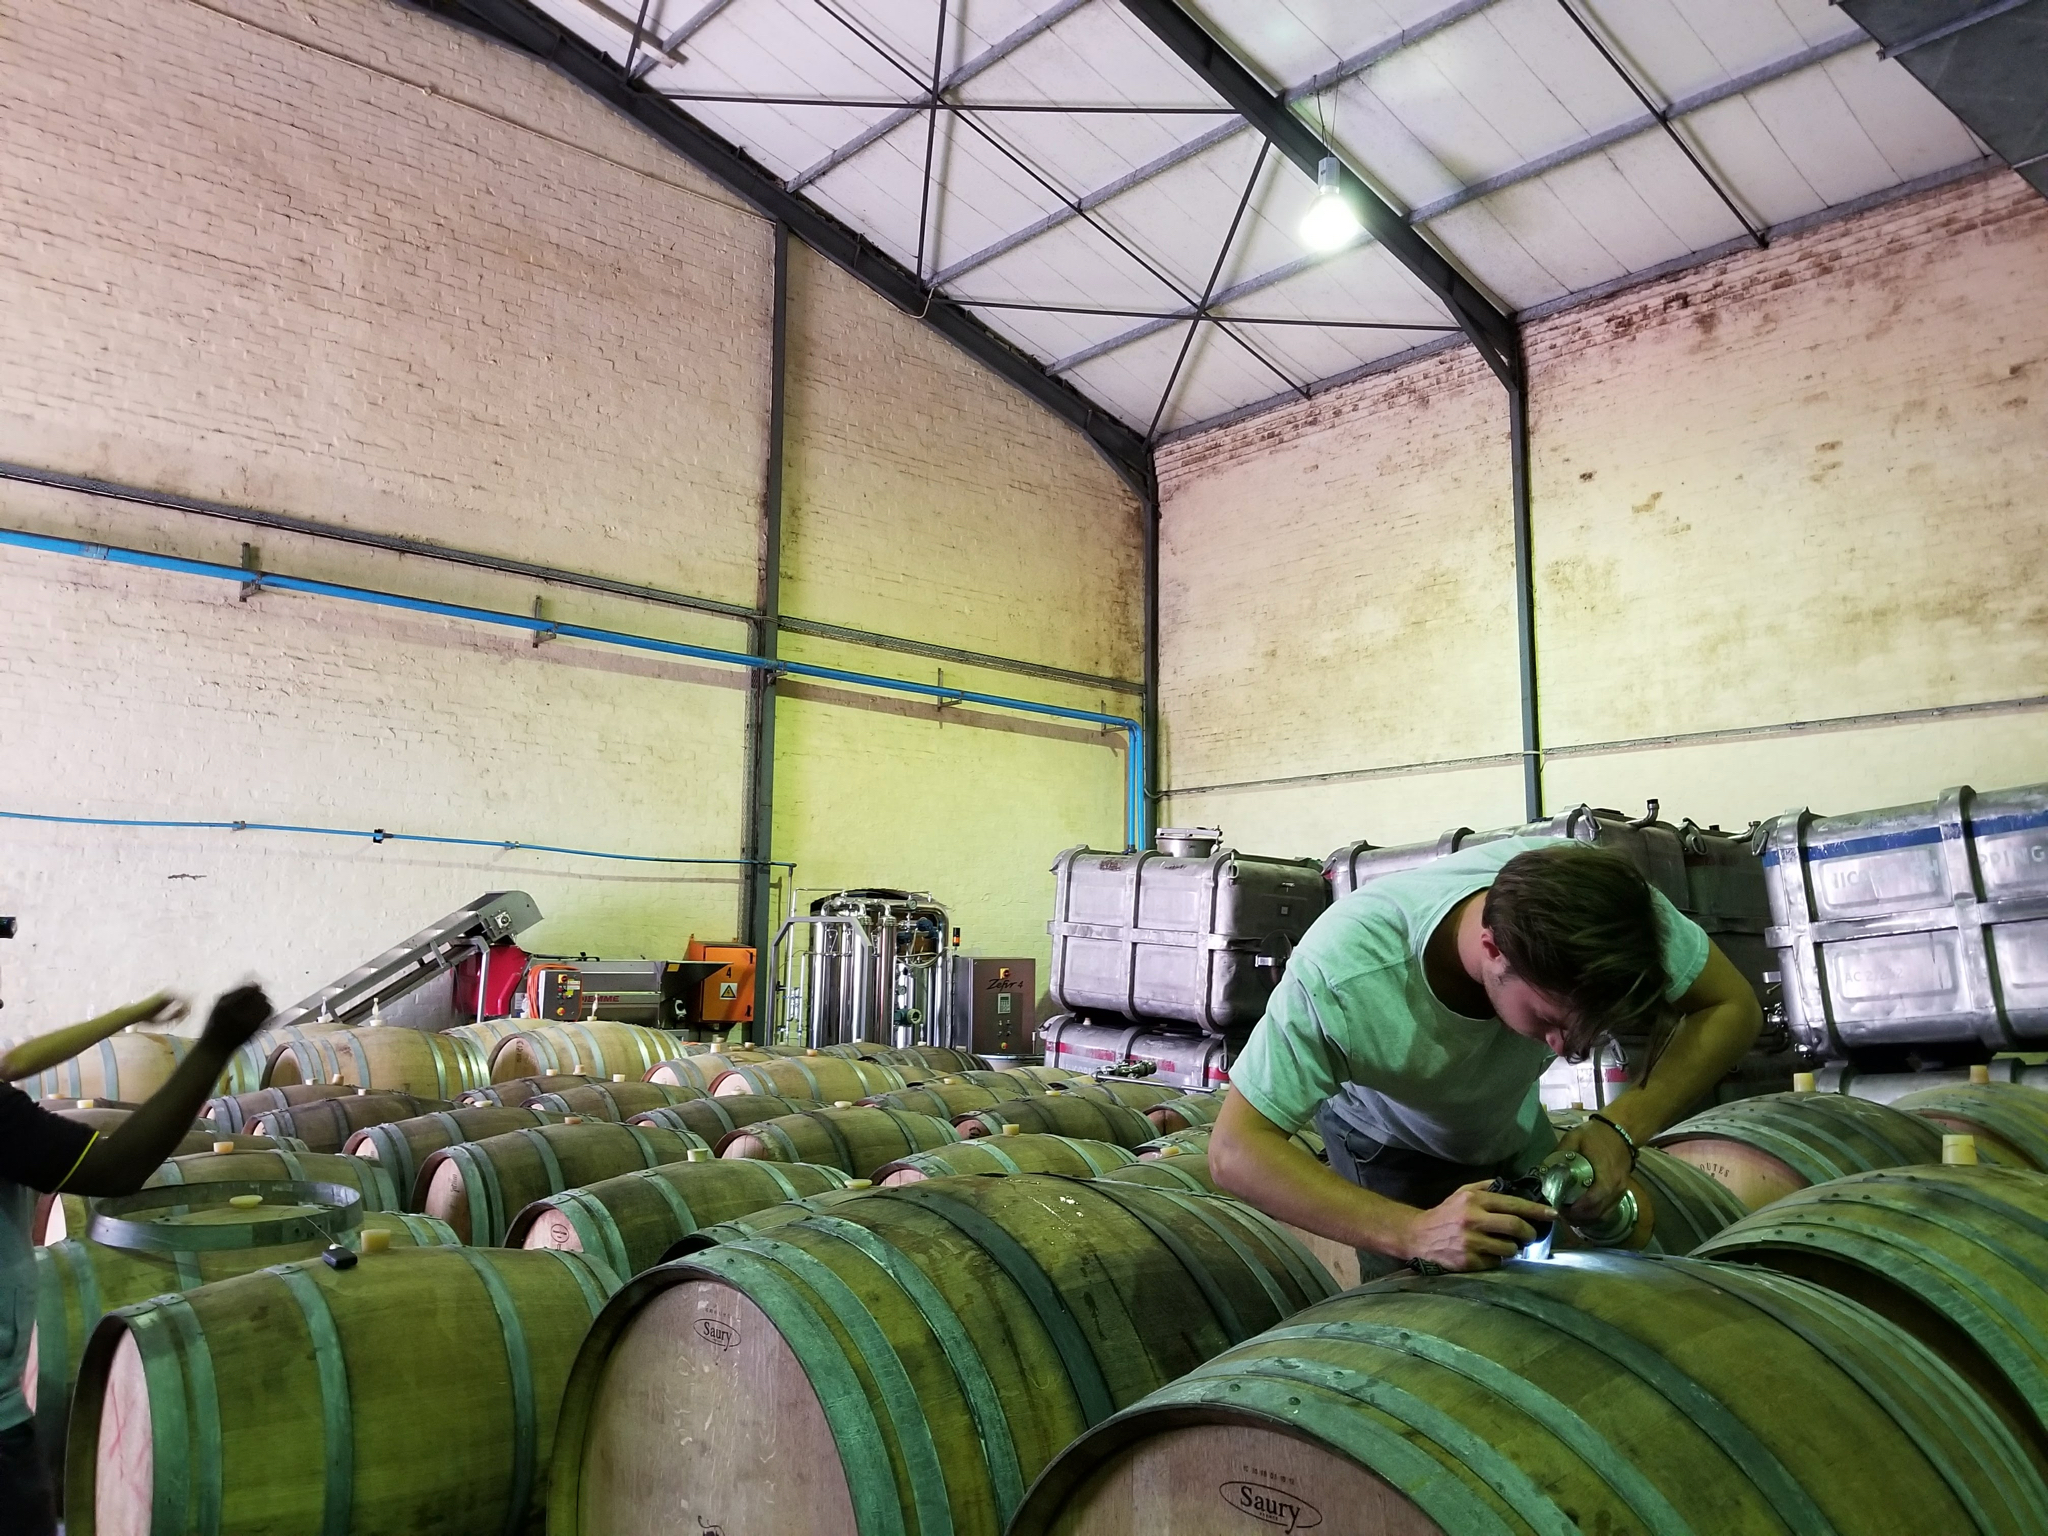 Walker Brown working on wine barrels